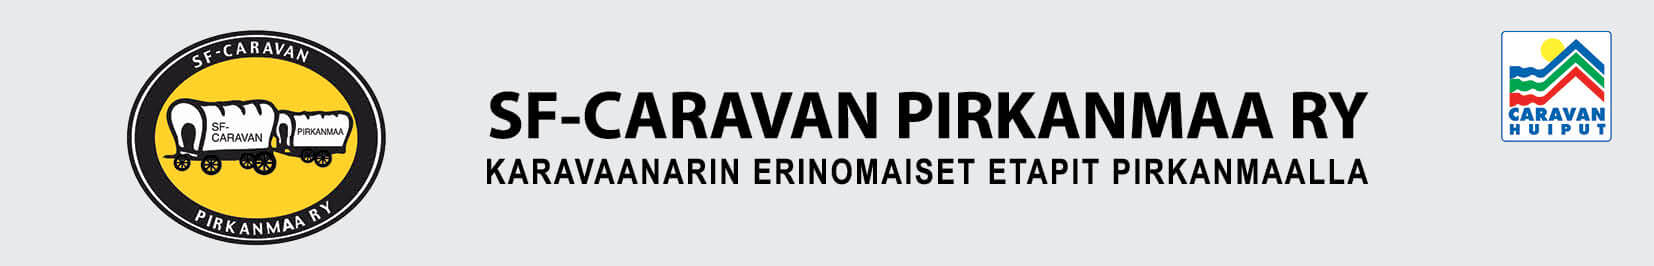 SFC-Pirkanmaa logo